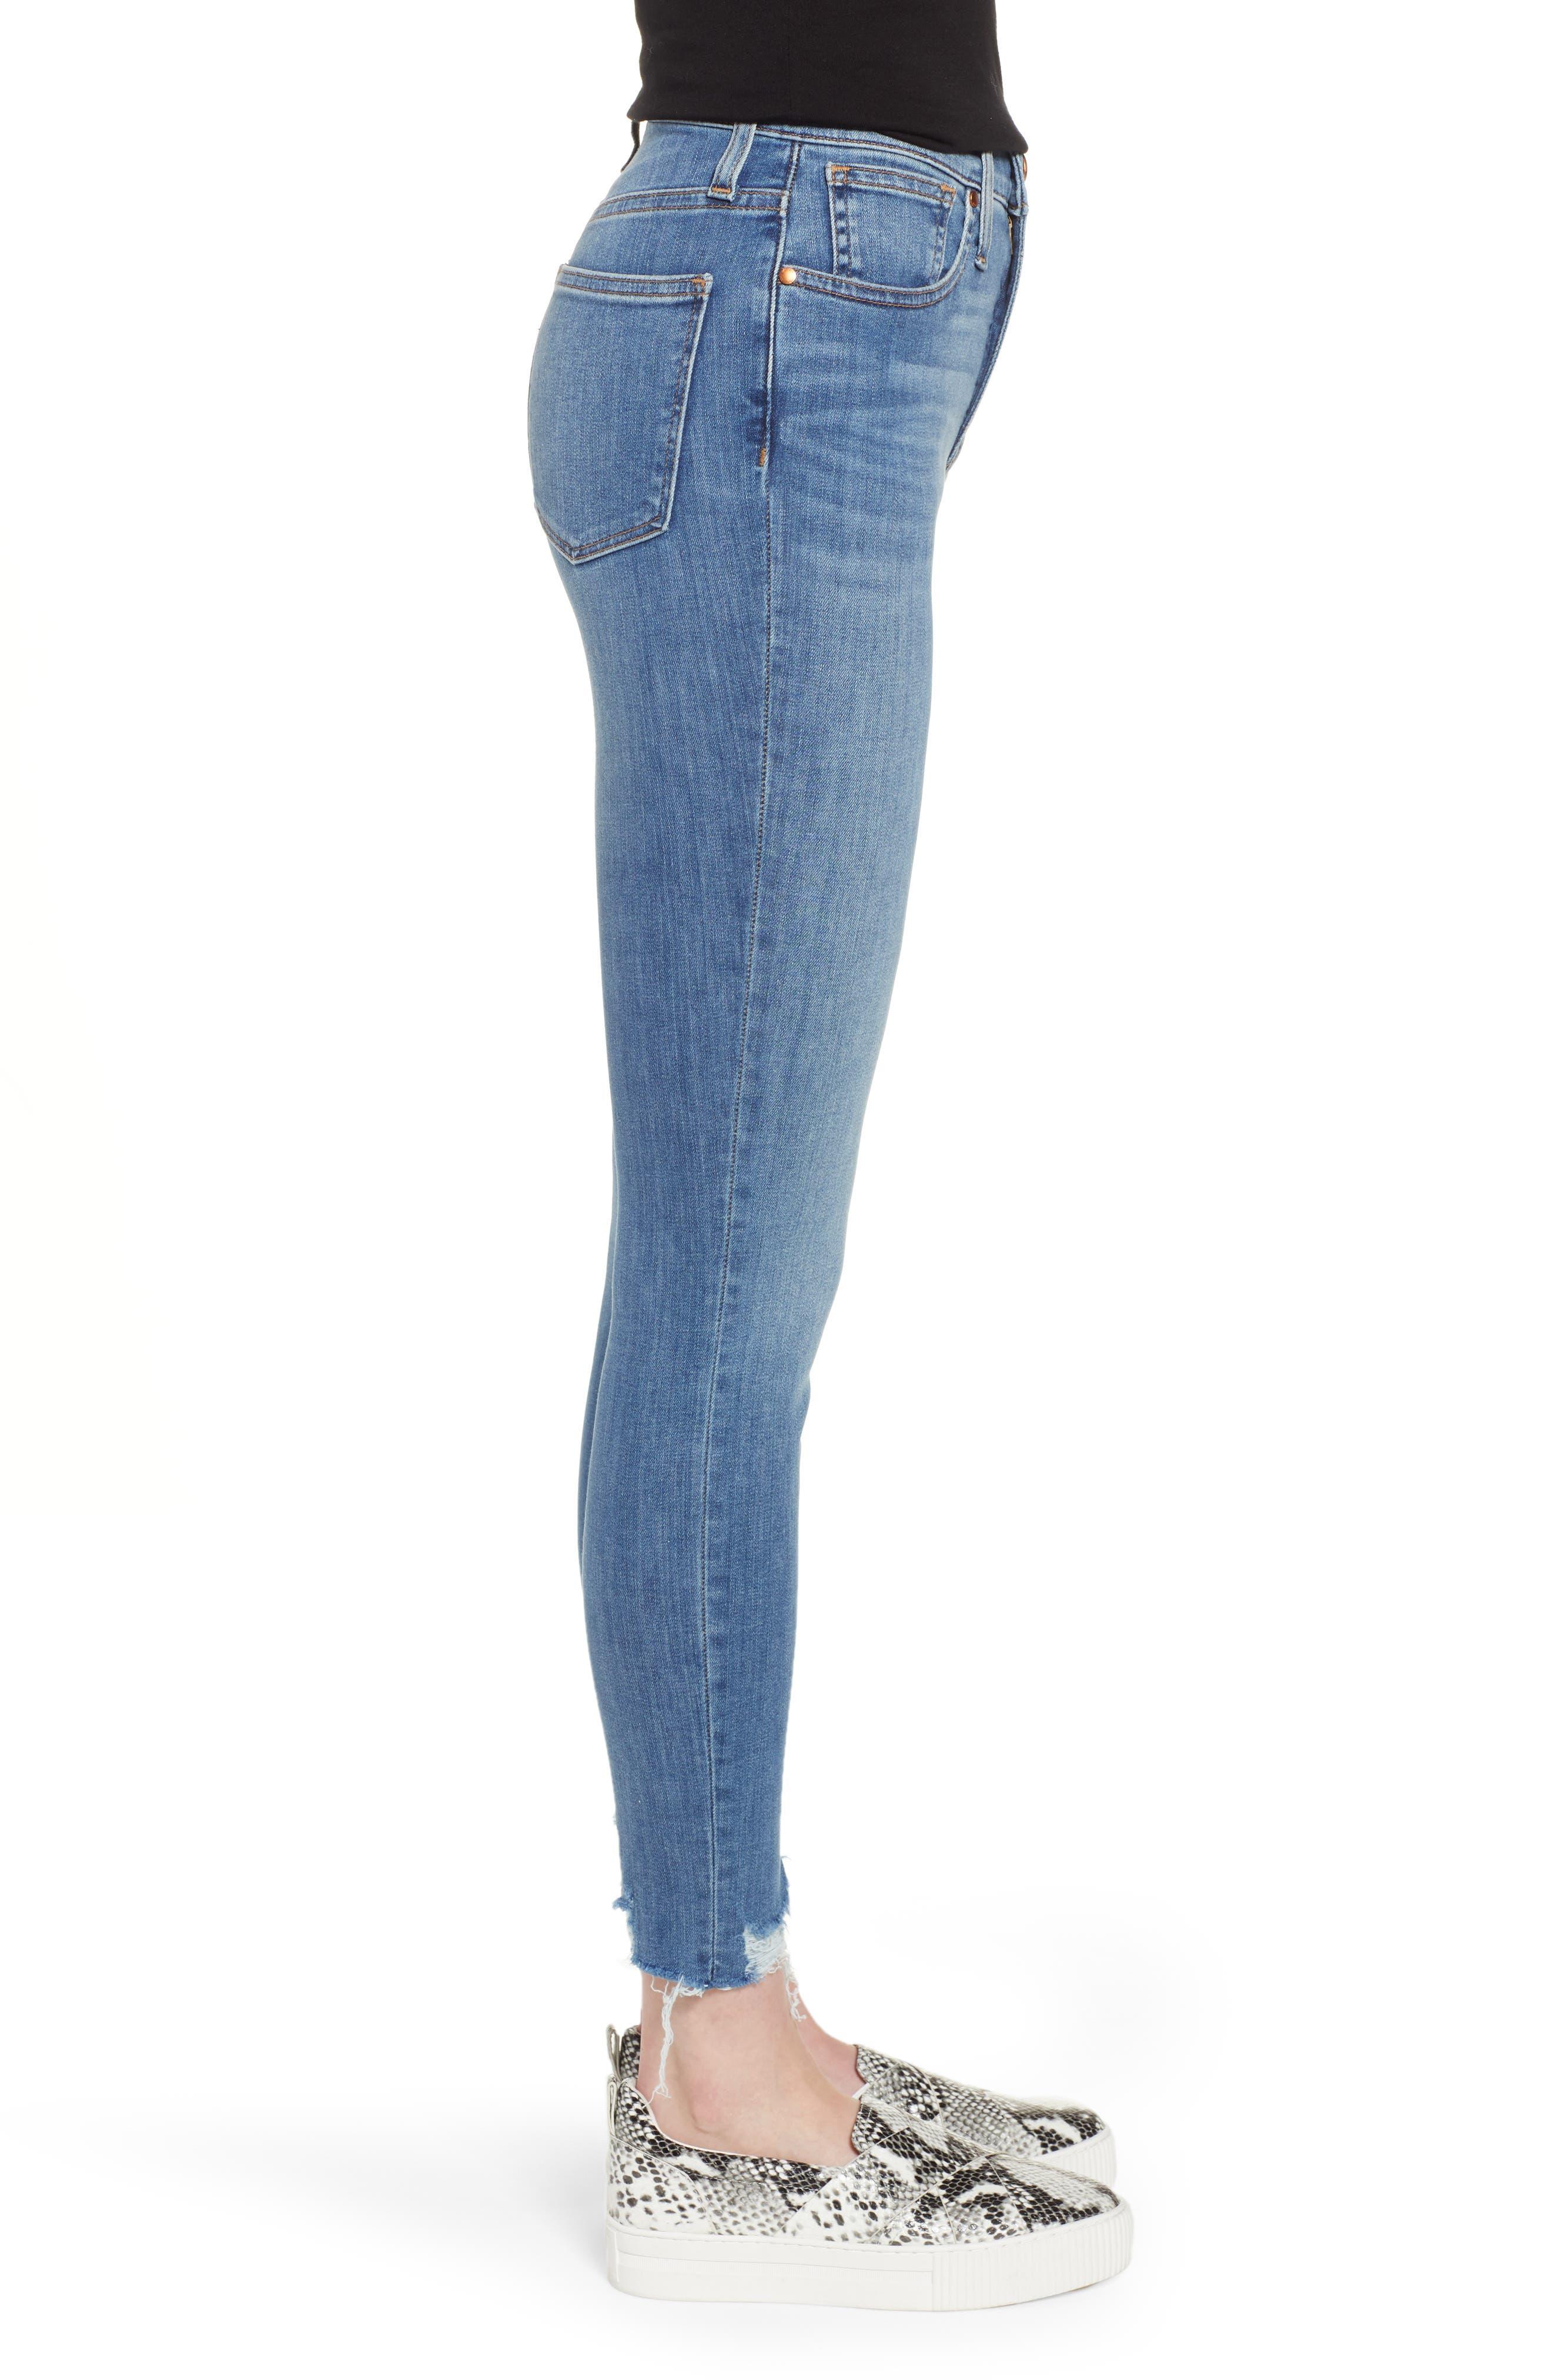 Sierra High Waist Raw Hem Skinny Jeans,                             Alternate thumbnail 3, color,                             NORIKO